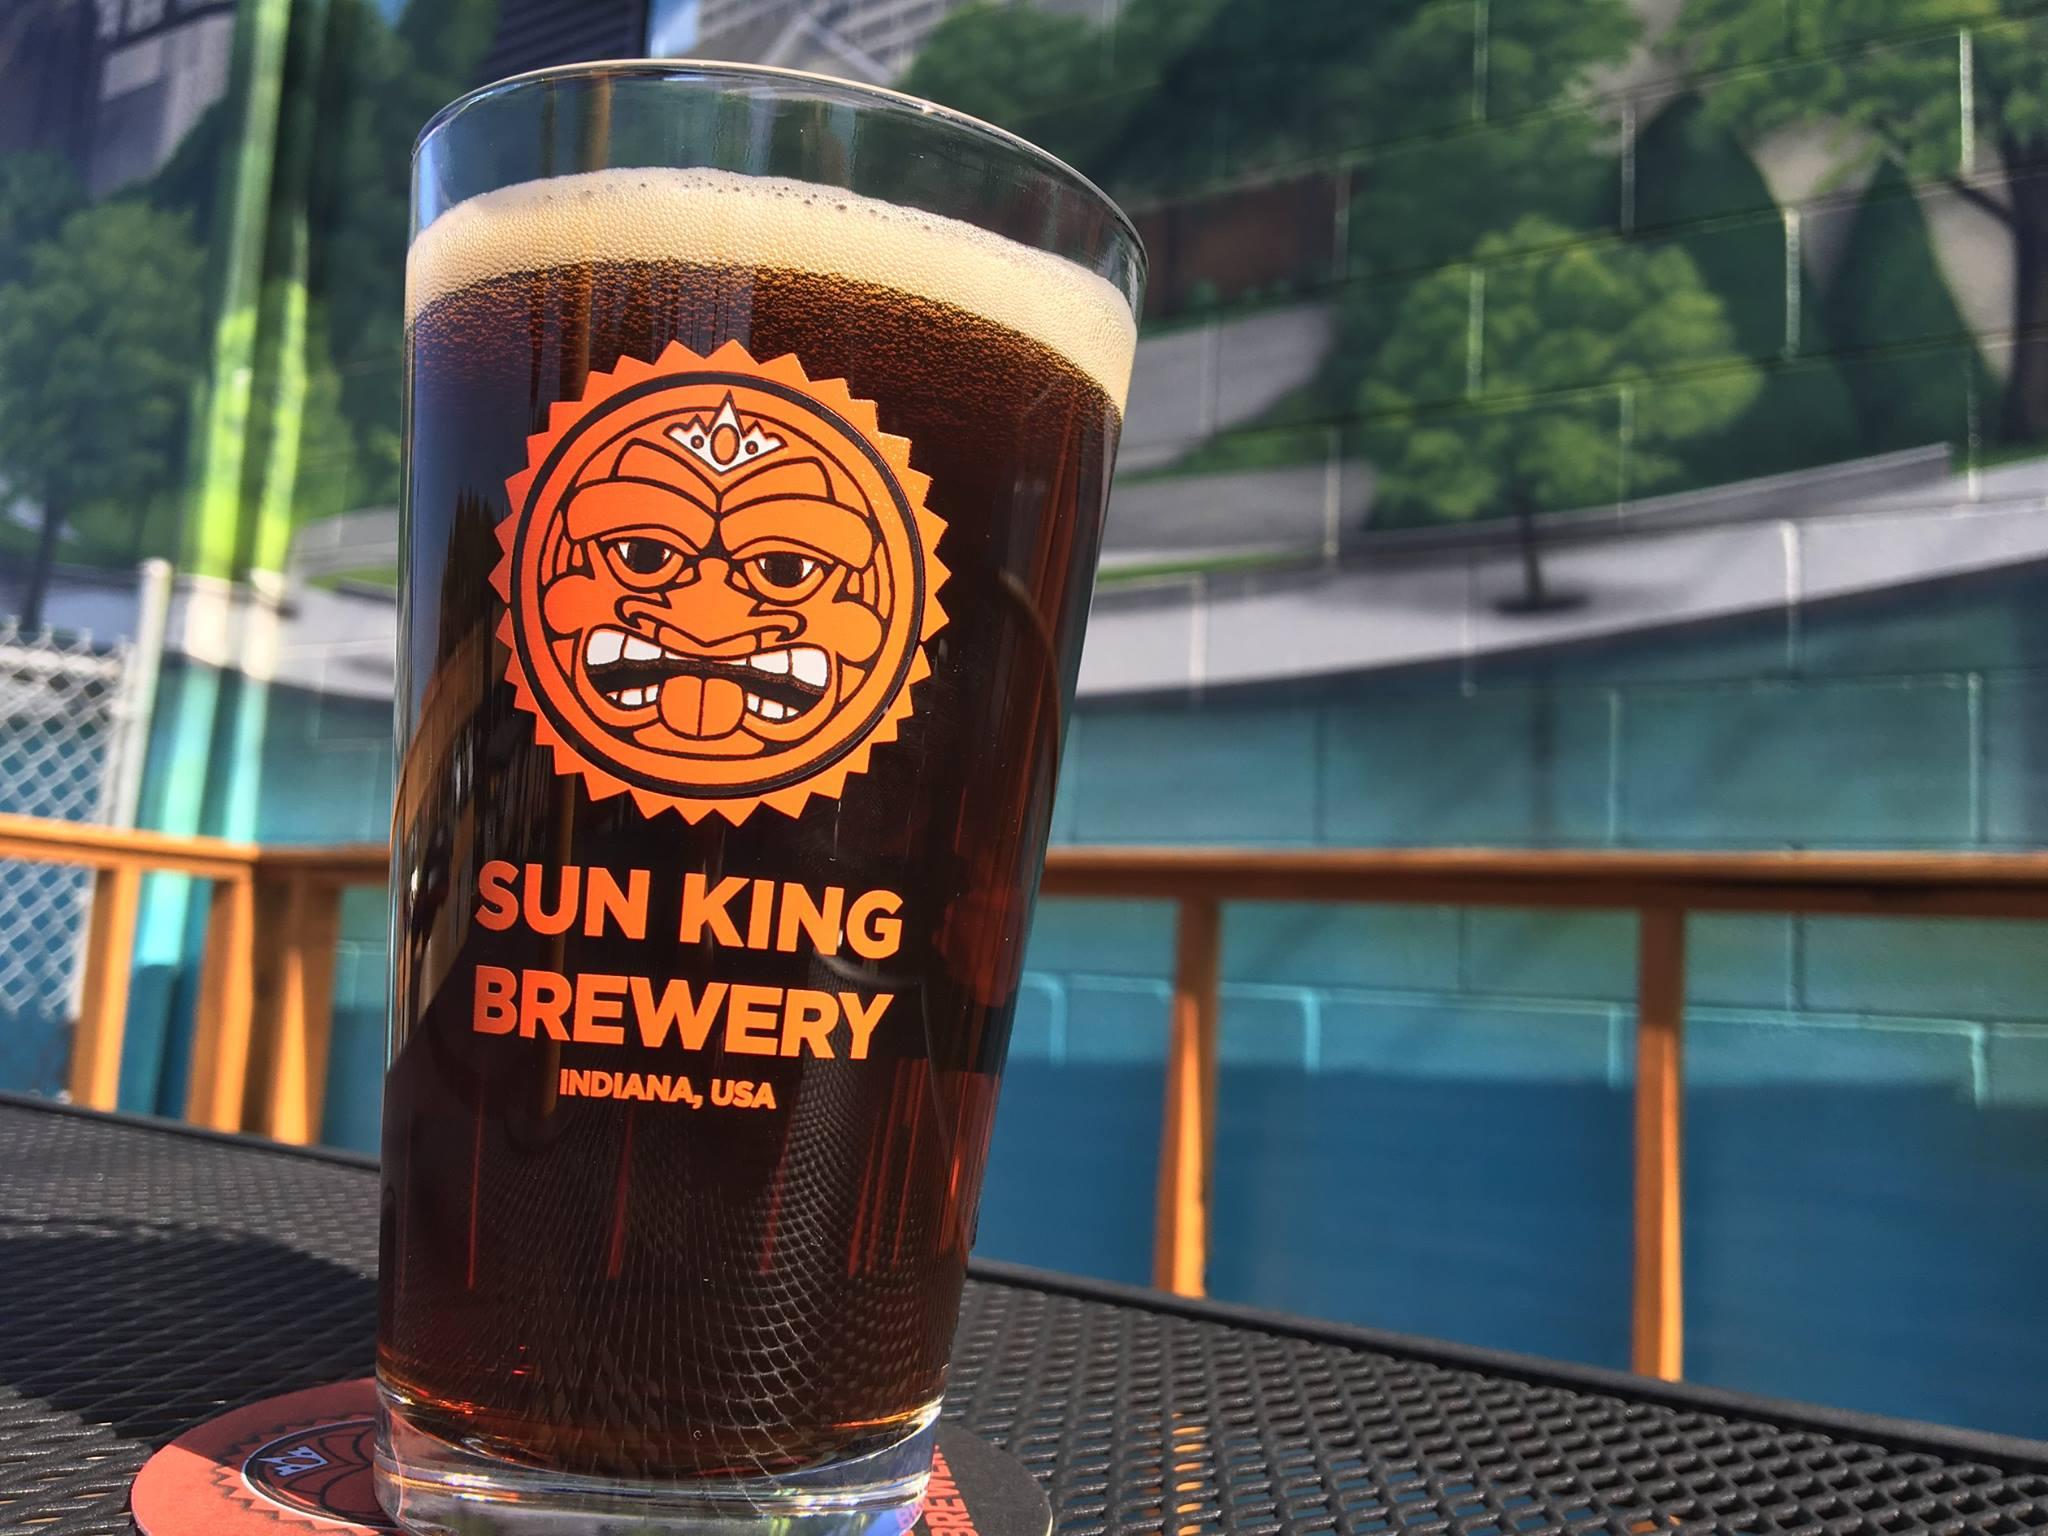 courtesy Sun King Brewery